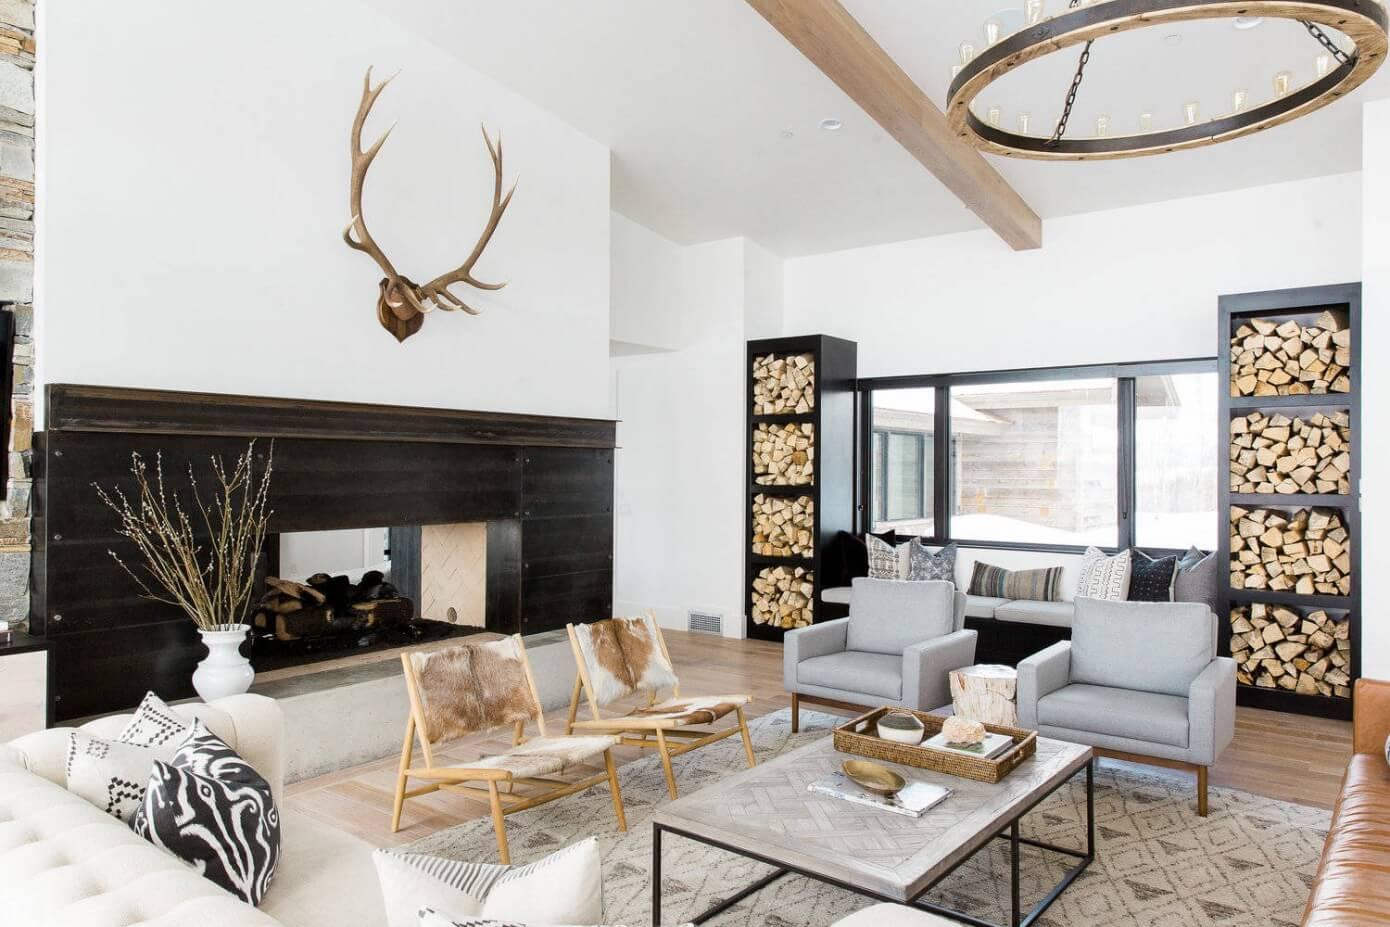 Modern Mountain Home By Studio McGee HomeAdore - Mountain home interior design